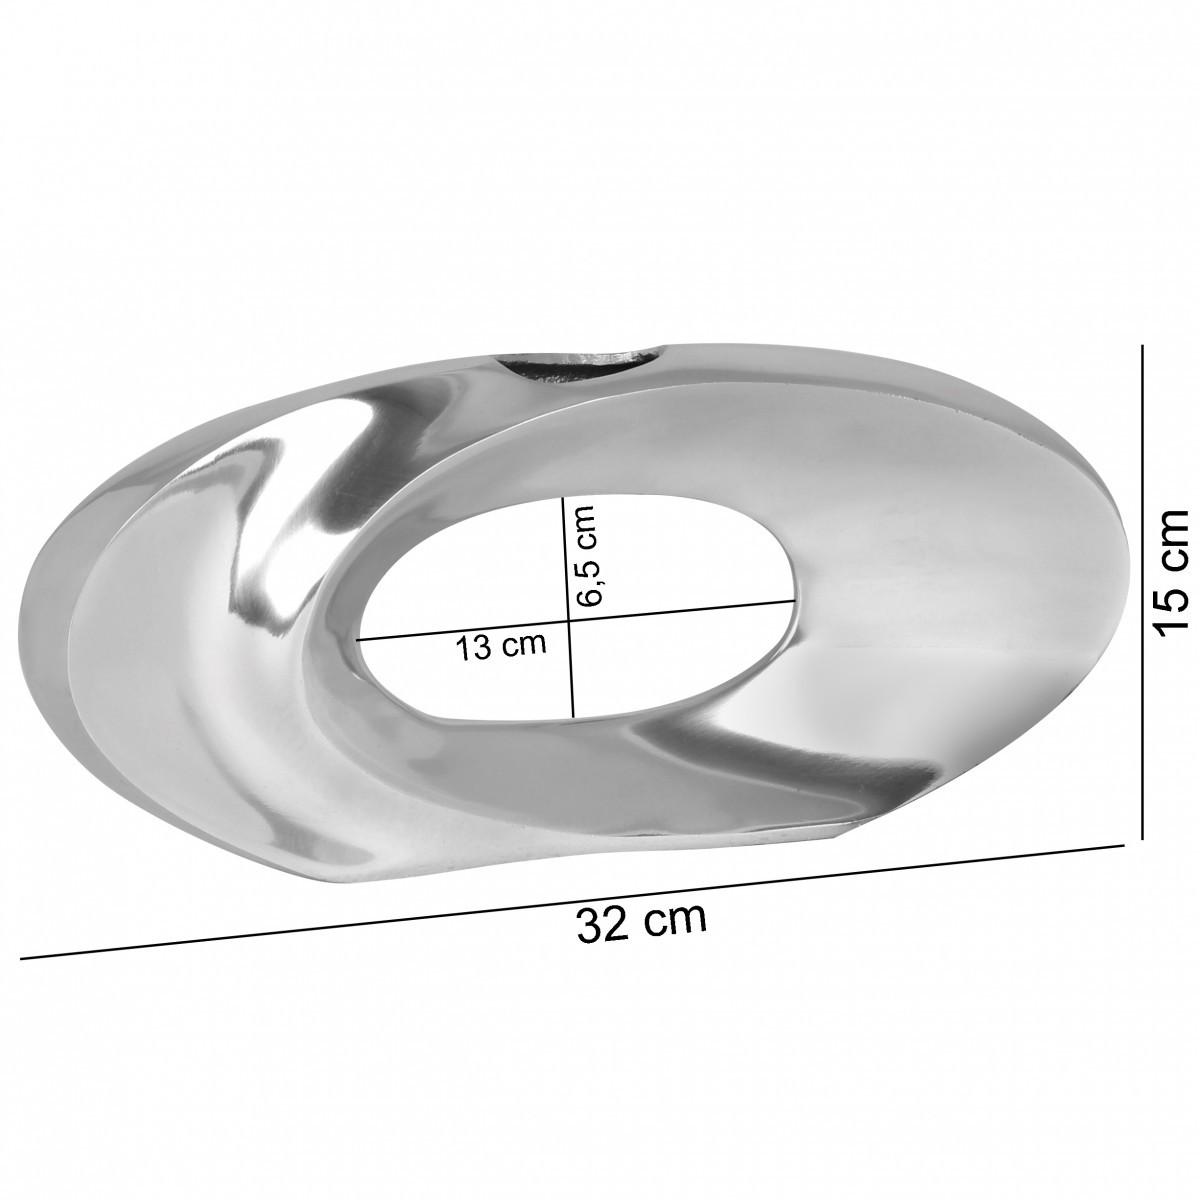 Finebuy deko vase klein iowa s aluminium modern mit 1 for Flurgarderobe schmal